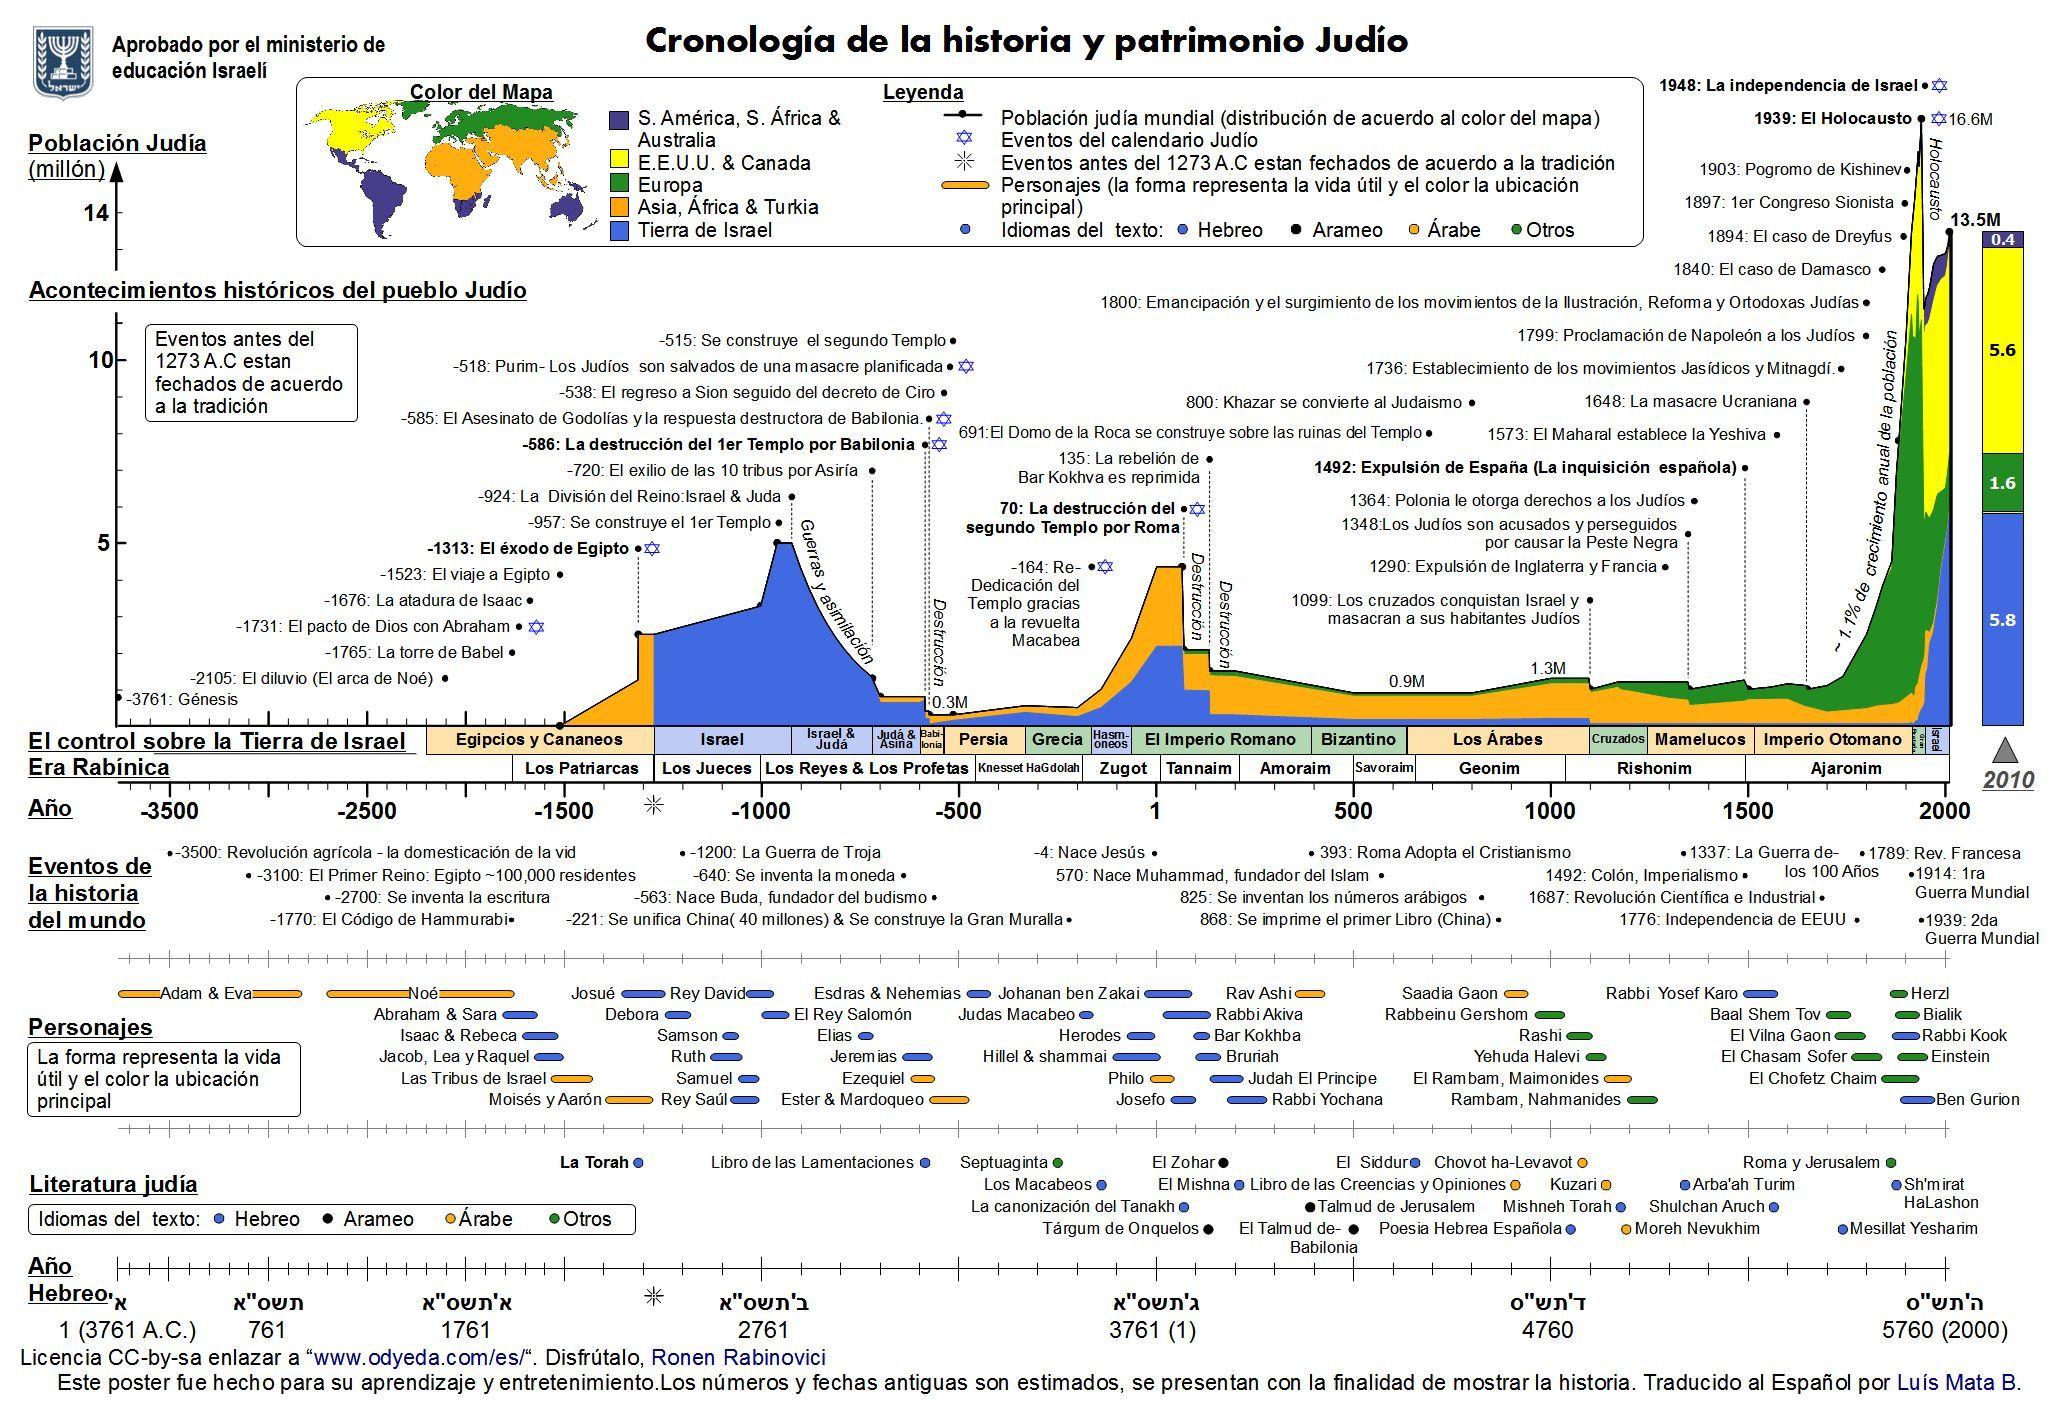 Cronologia Judio